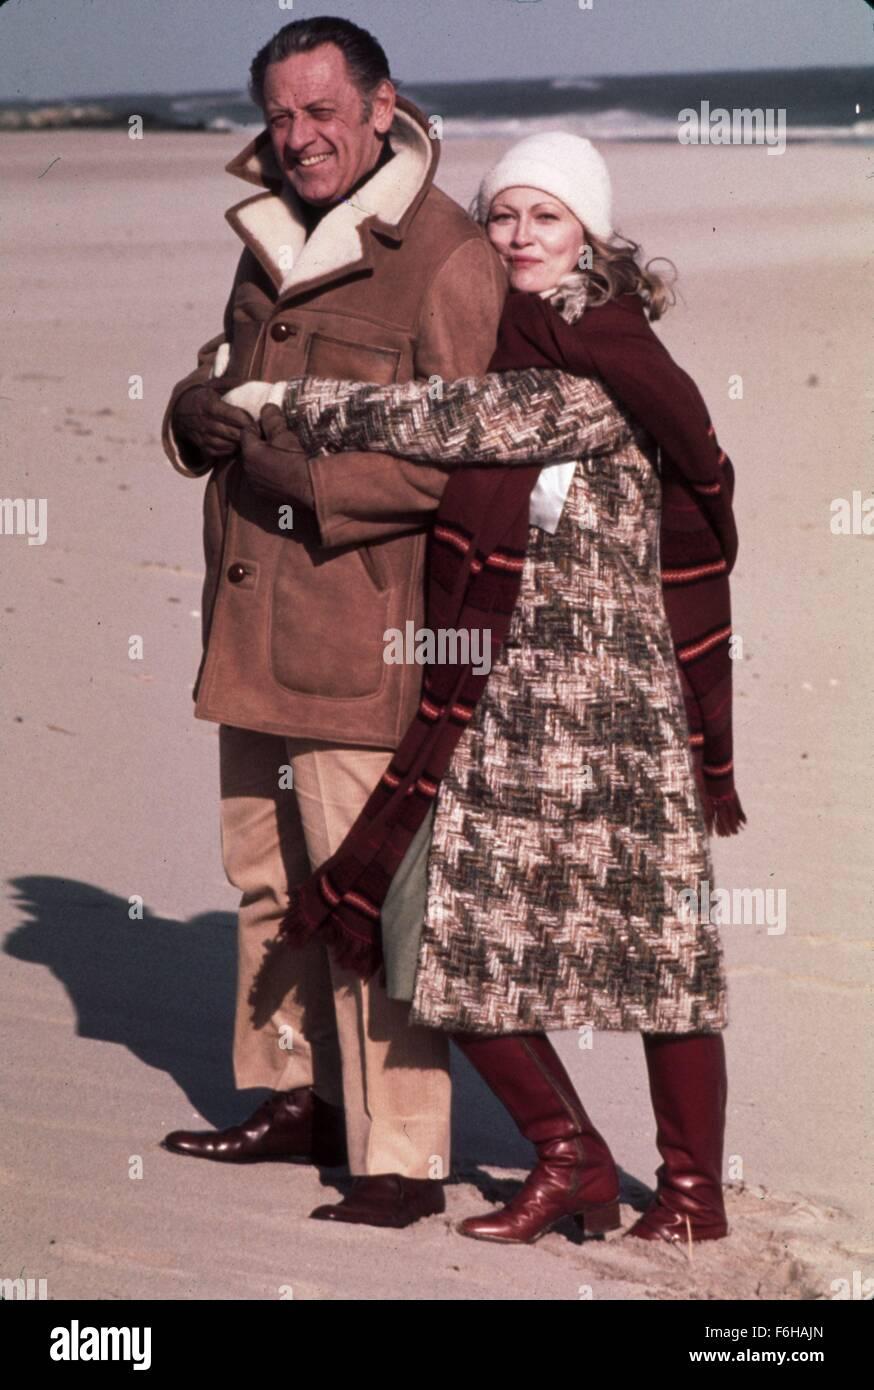 Faye dunaway network - Network 1976 Film Title Network Director Sidney Lumet Pictured Beach